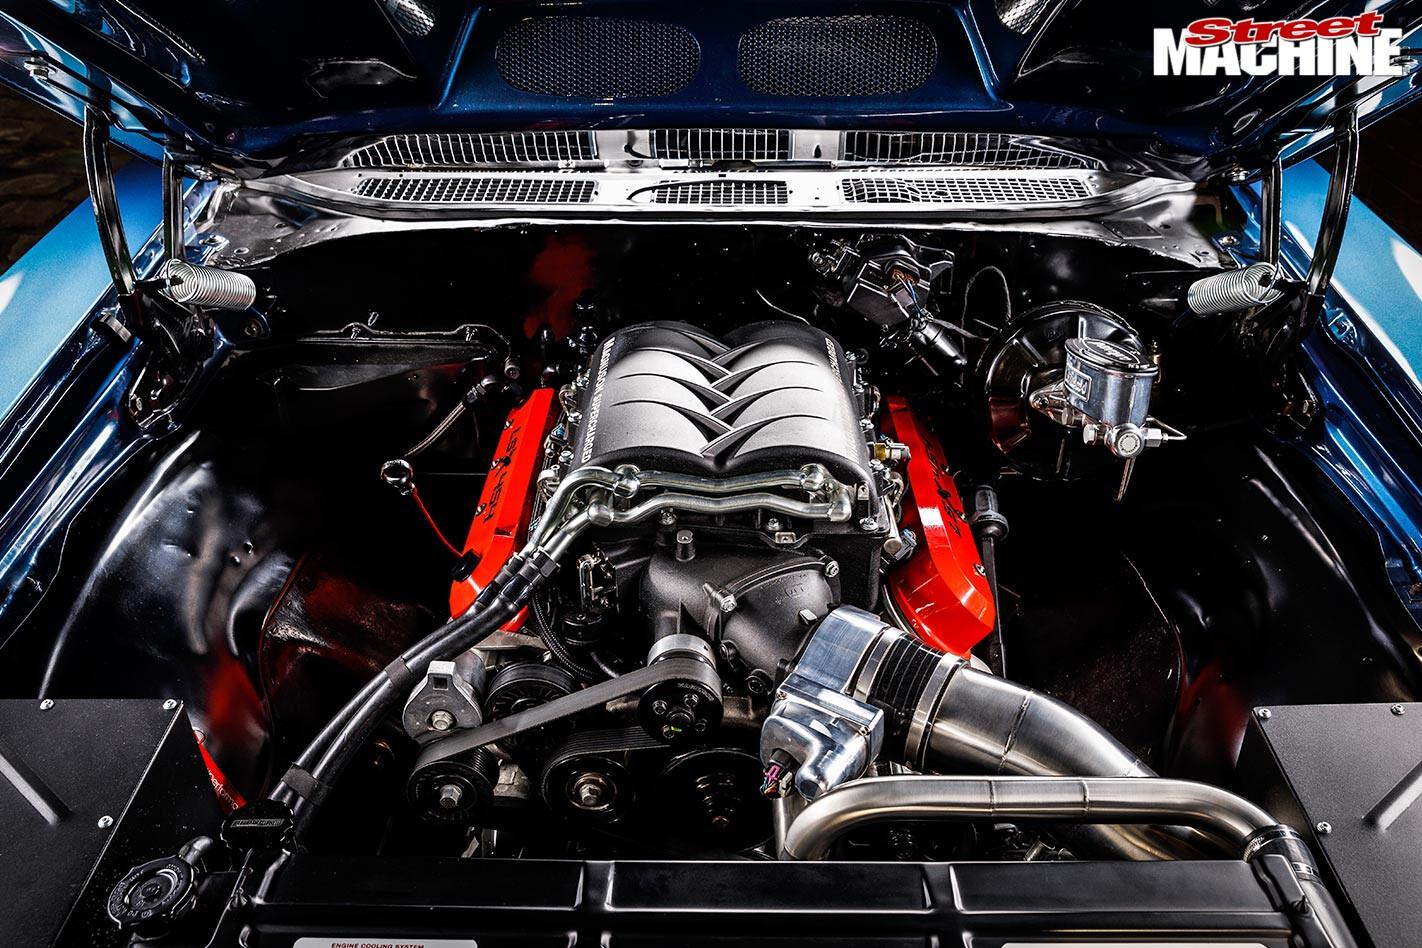 Chevelle SS engine bay